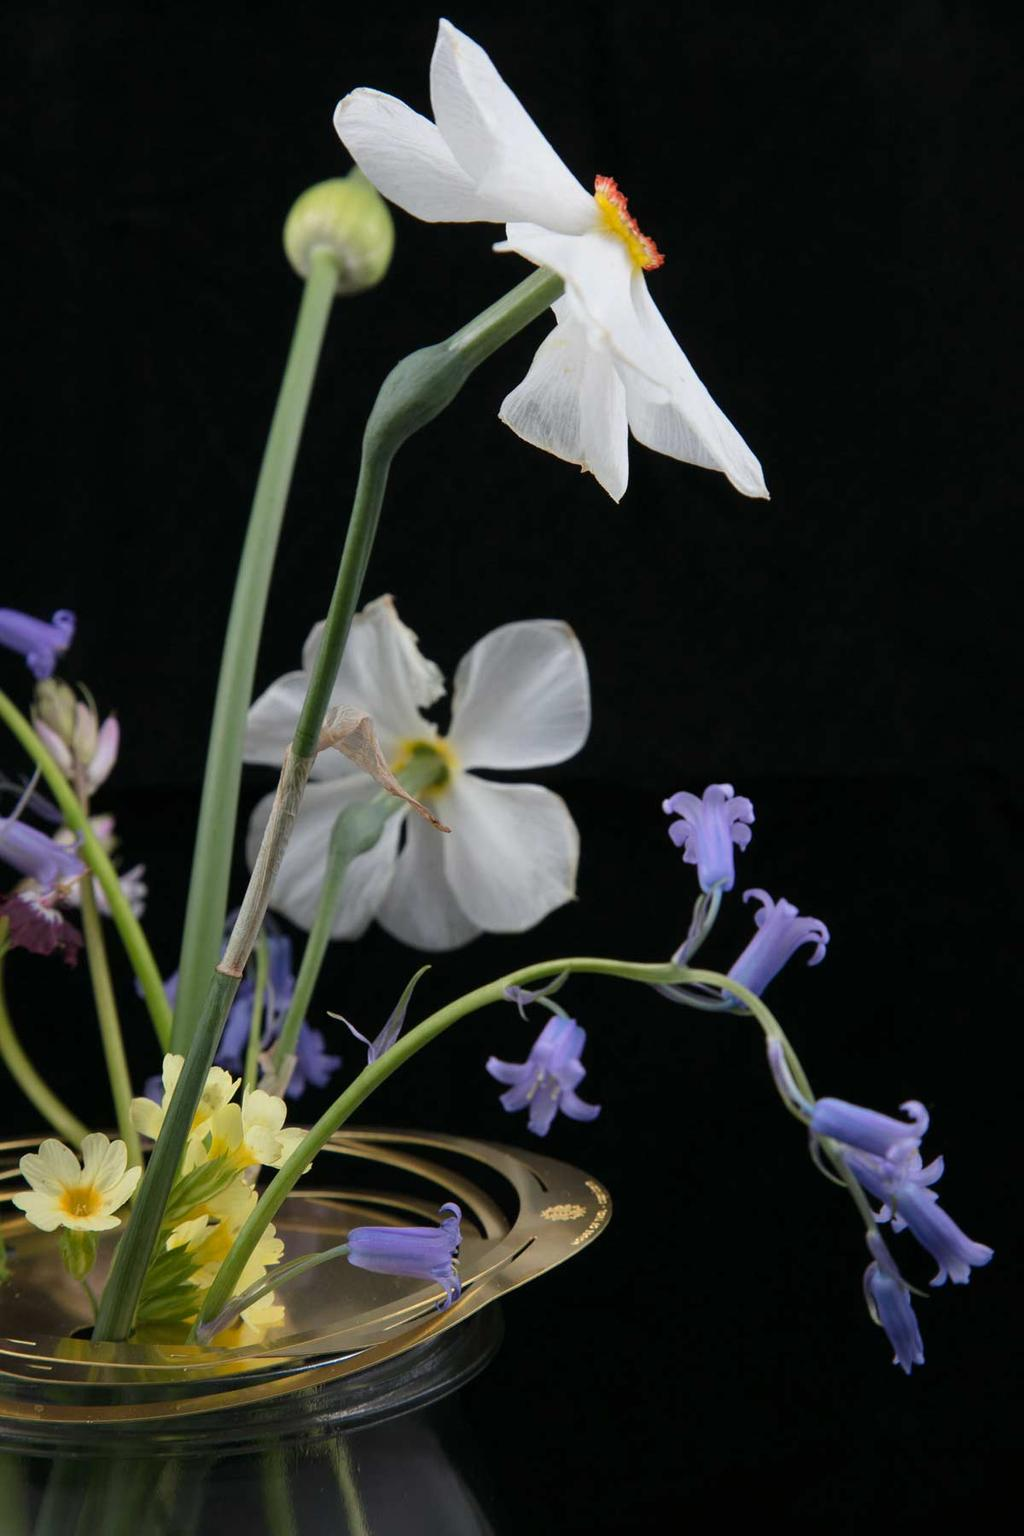 Bloemen met Flower Constellation van House of Thol voor zwarte muur